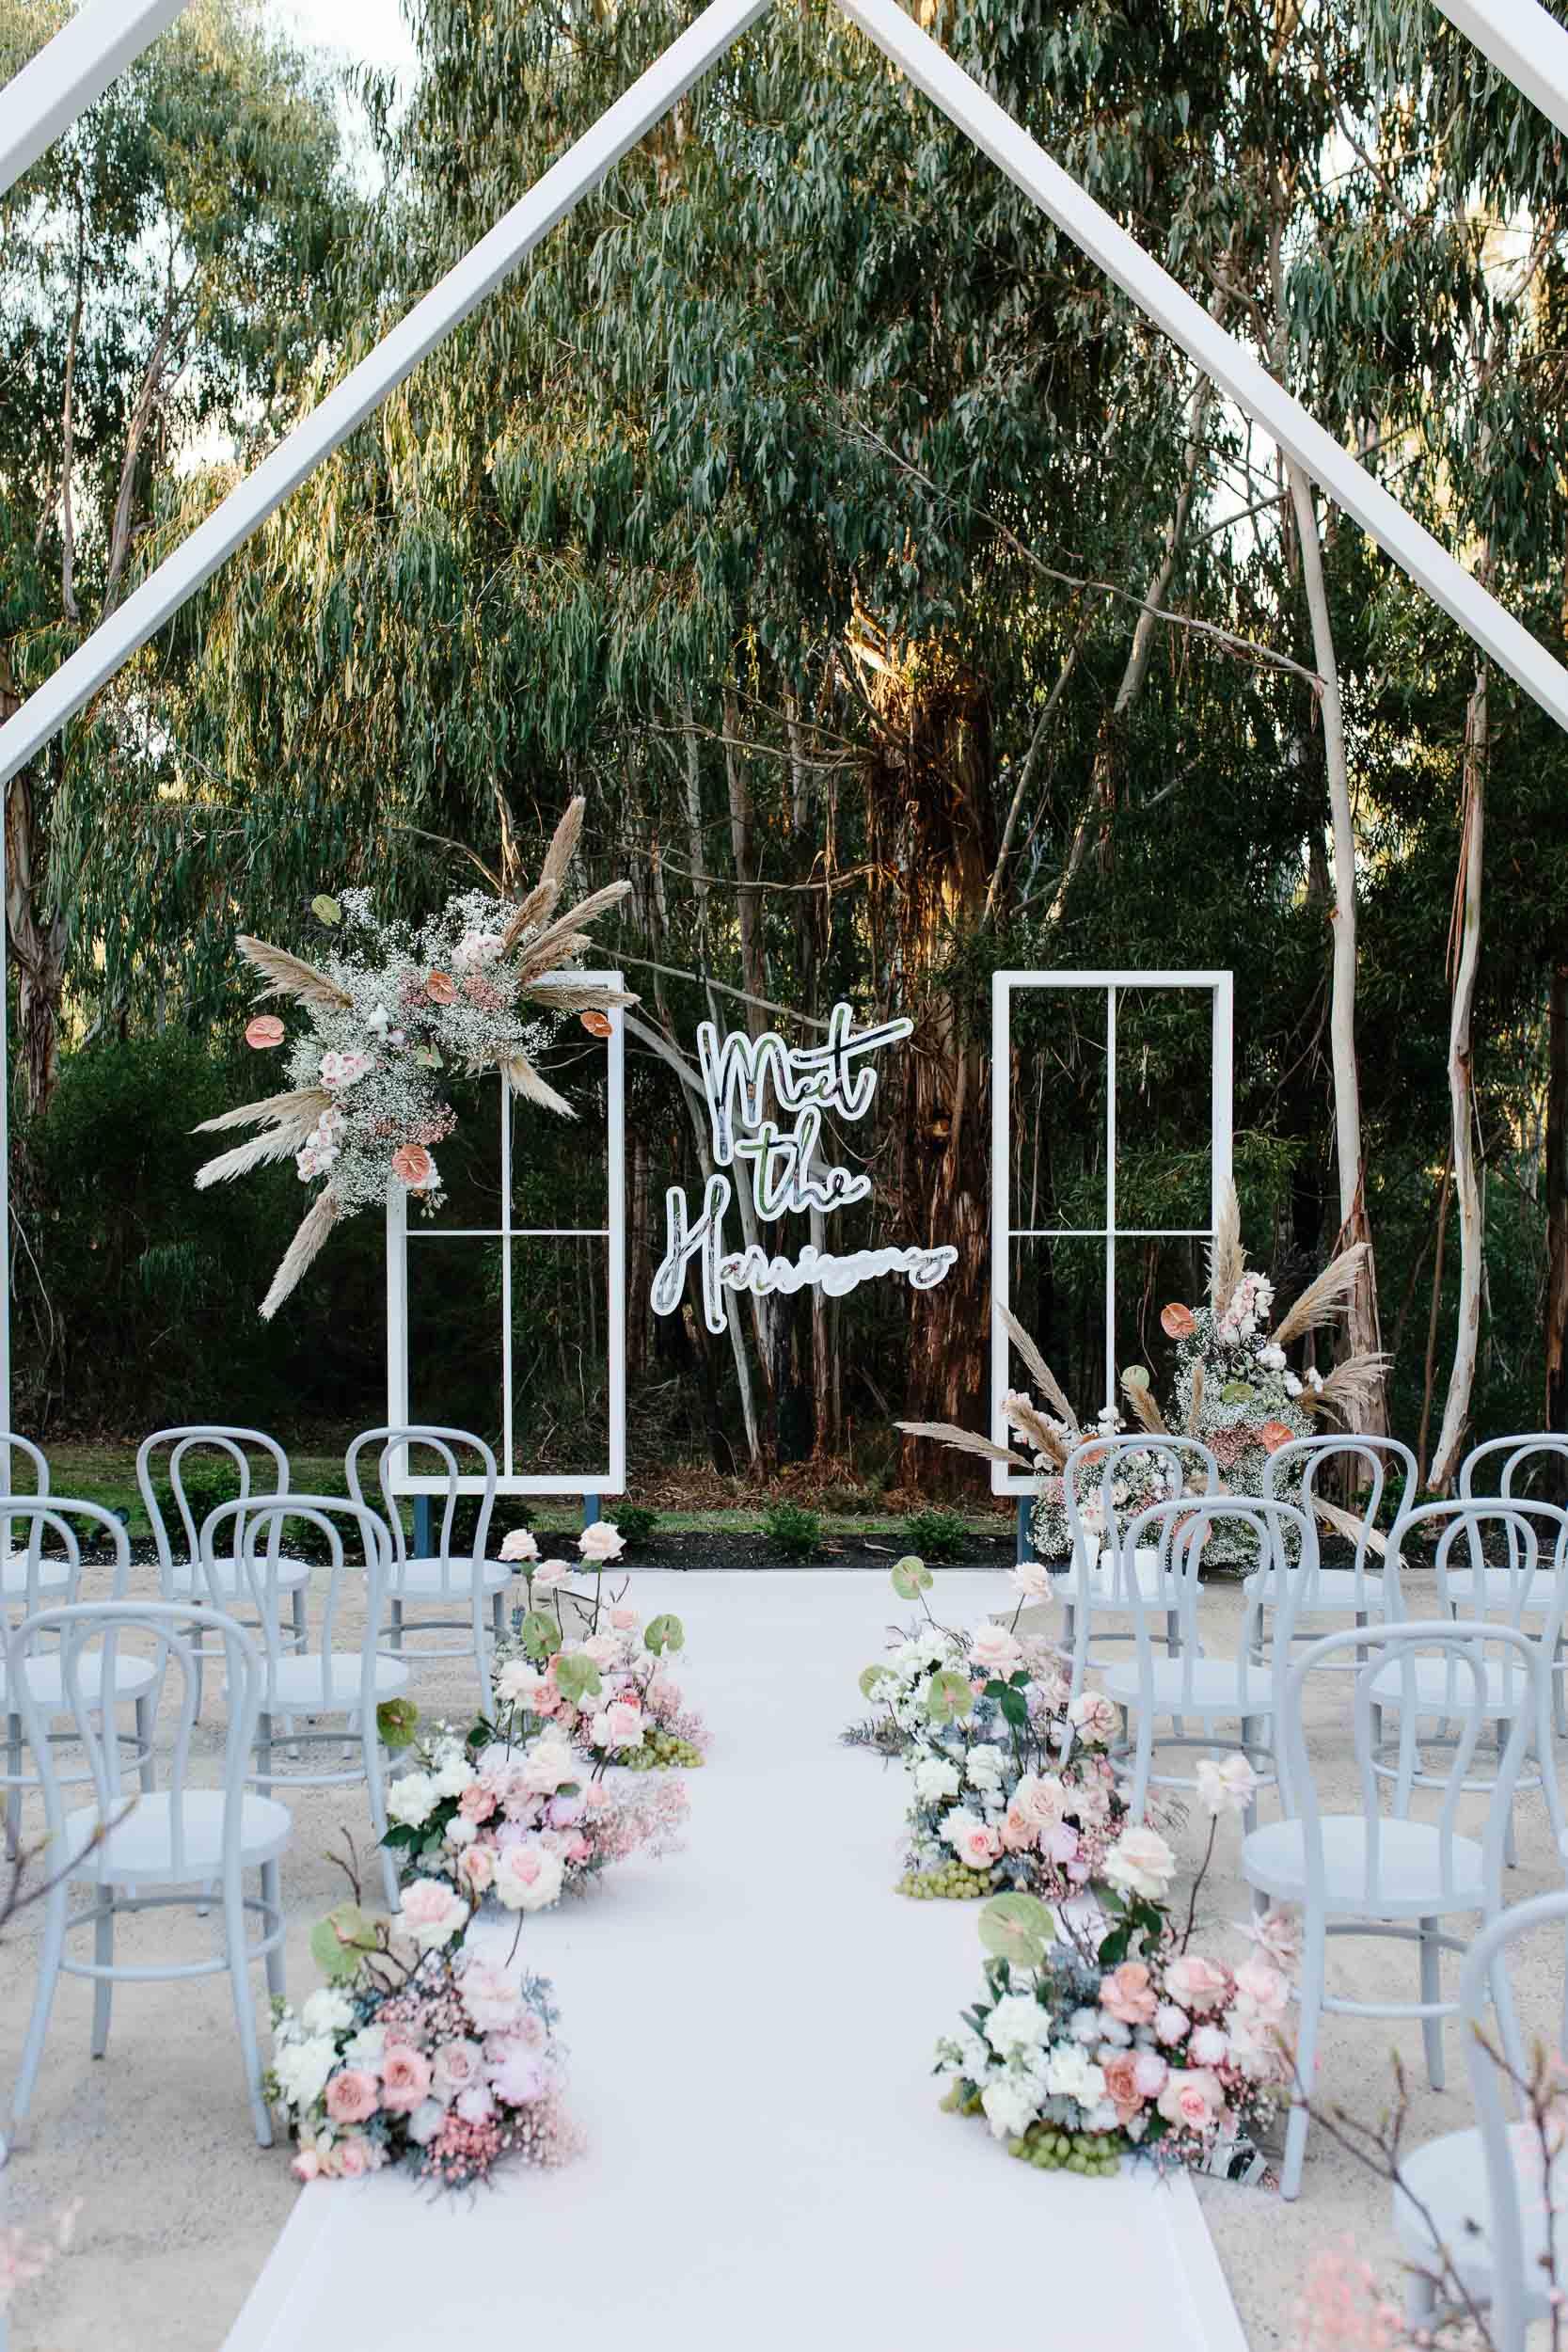 Kas-Richards-LENZO-Yarra-Valley-Wedding-One-Day-Bridal-299.jpg